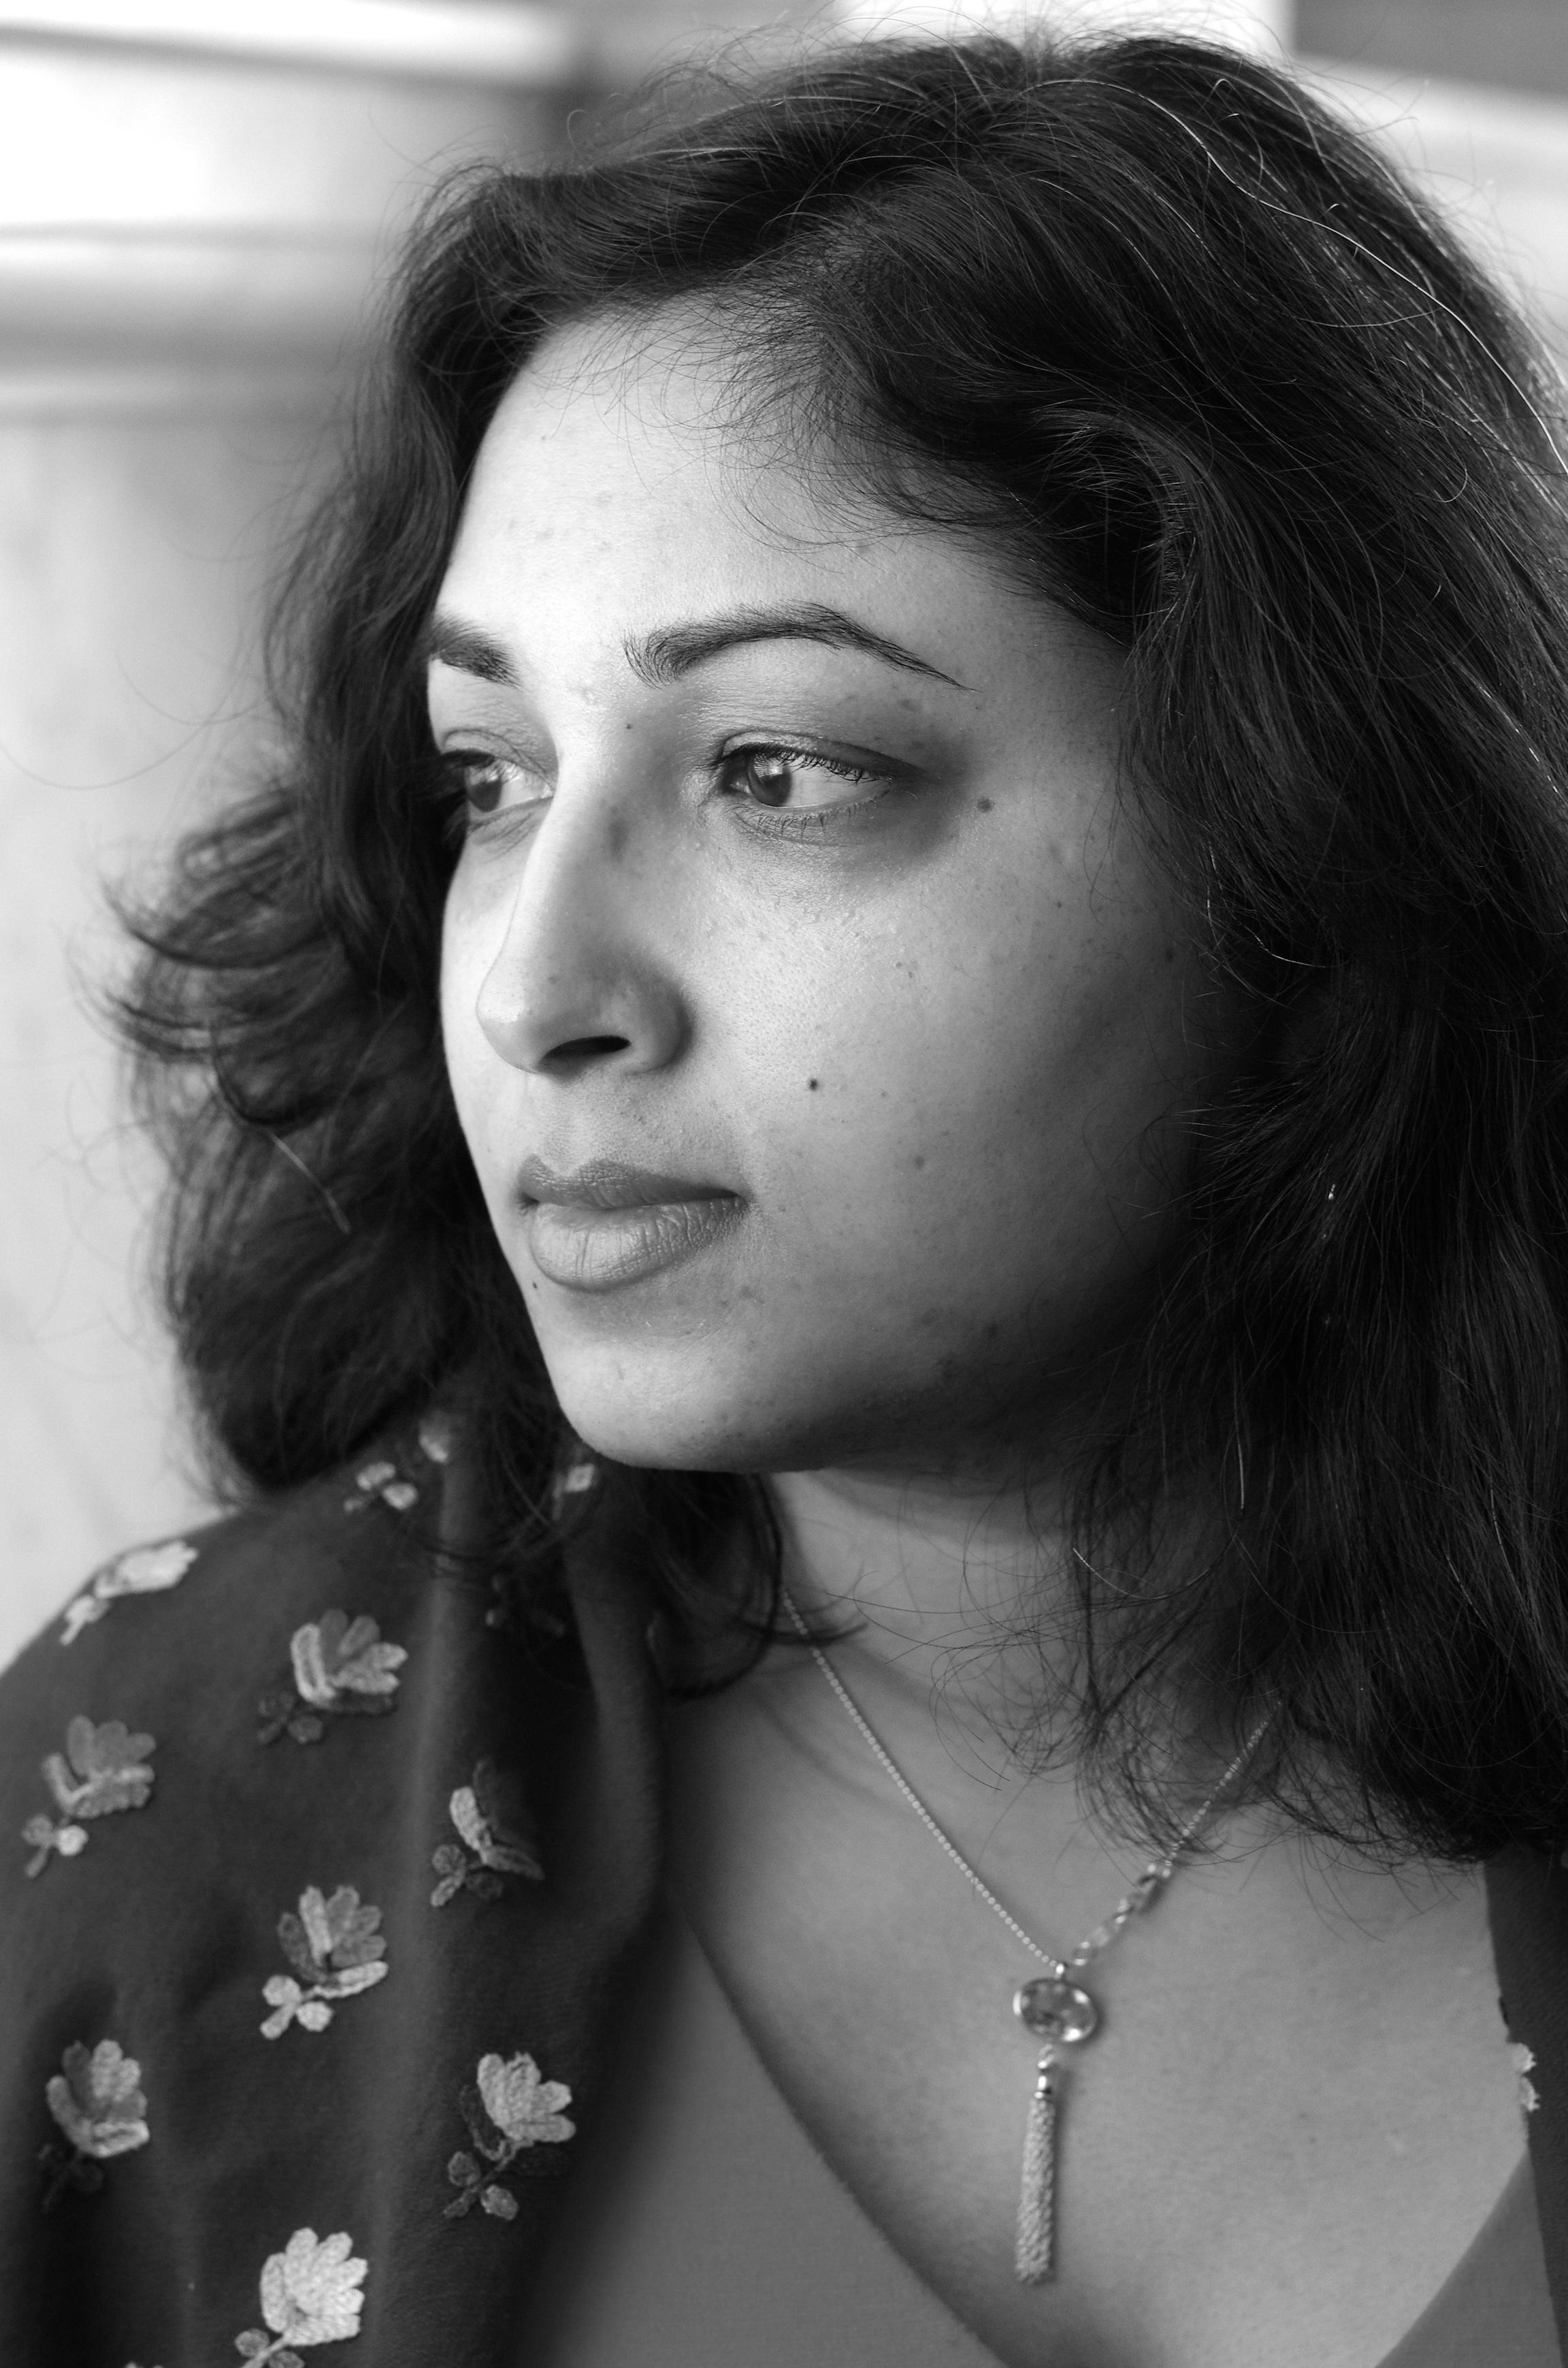 Bahadur Author Photo Web site